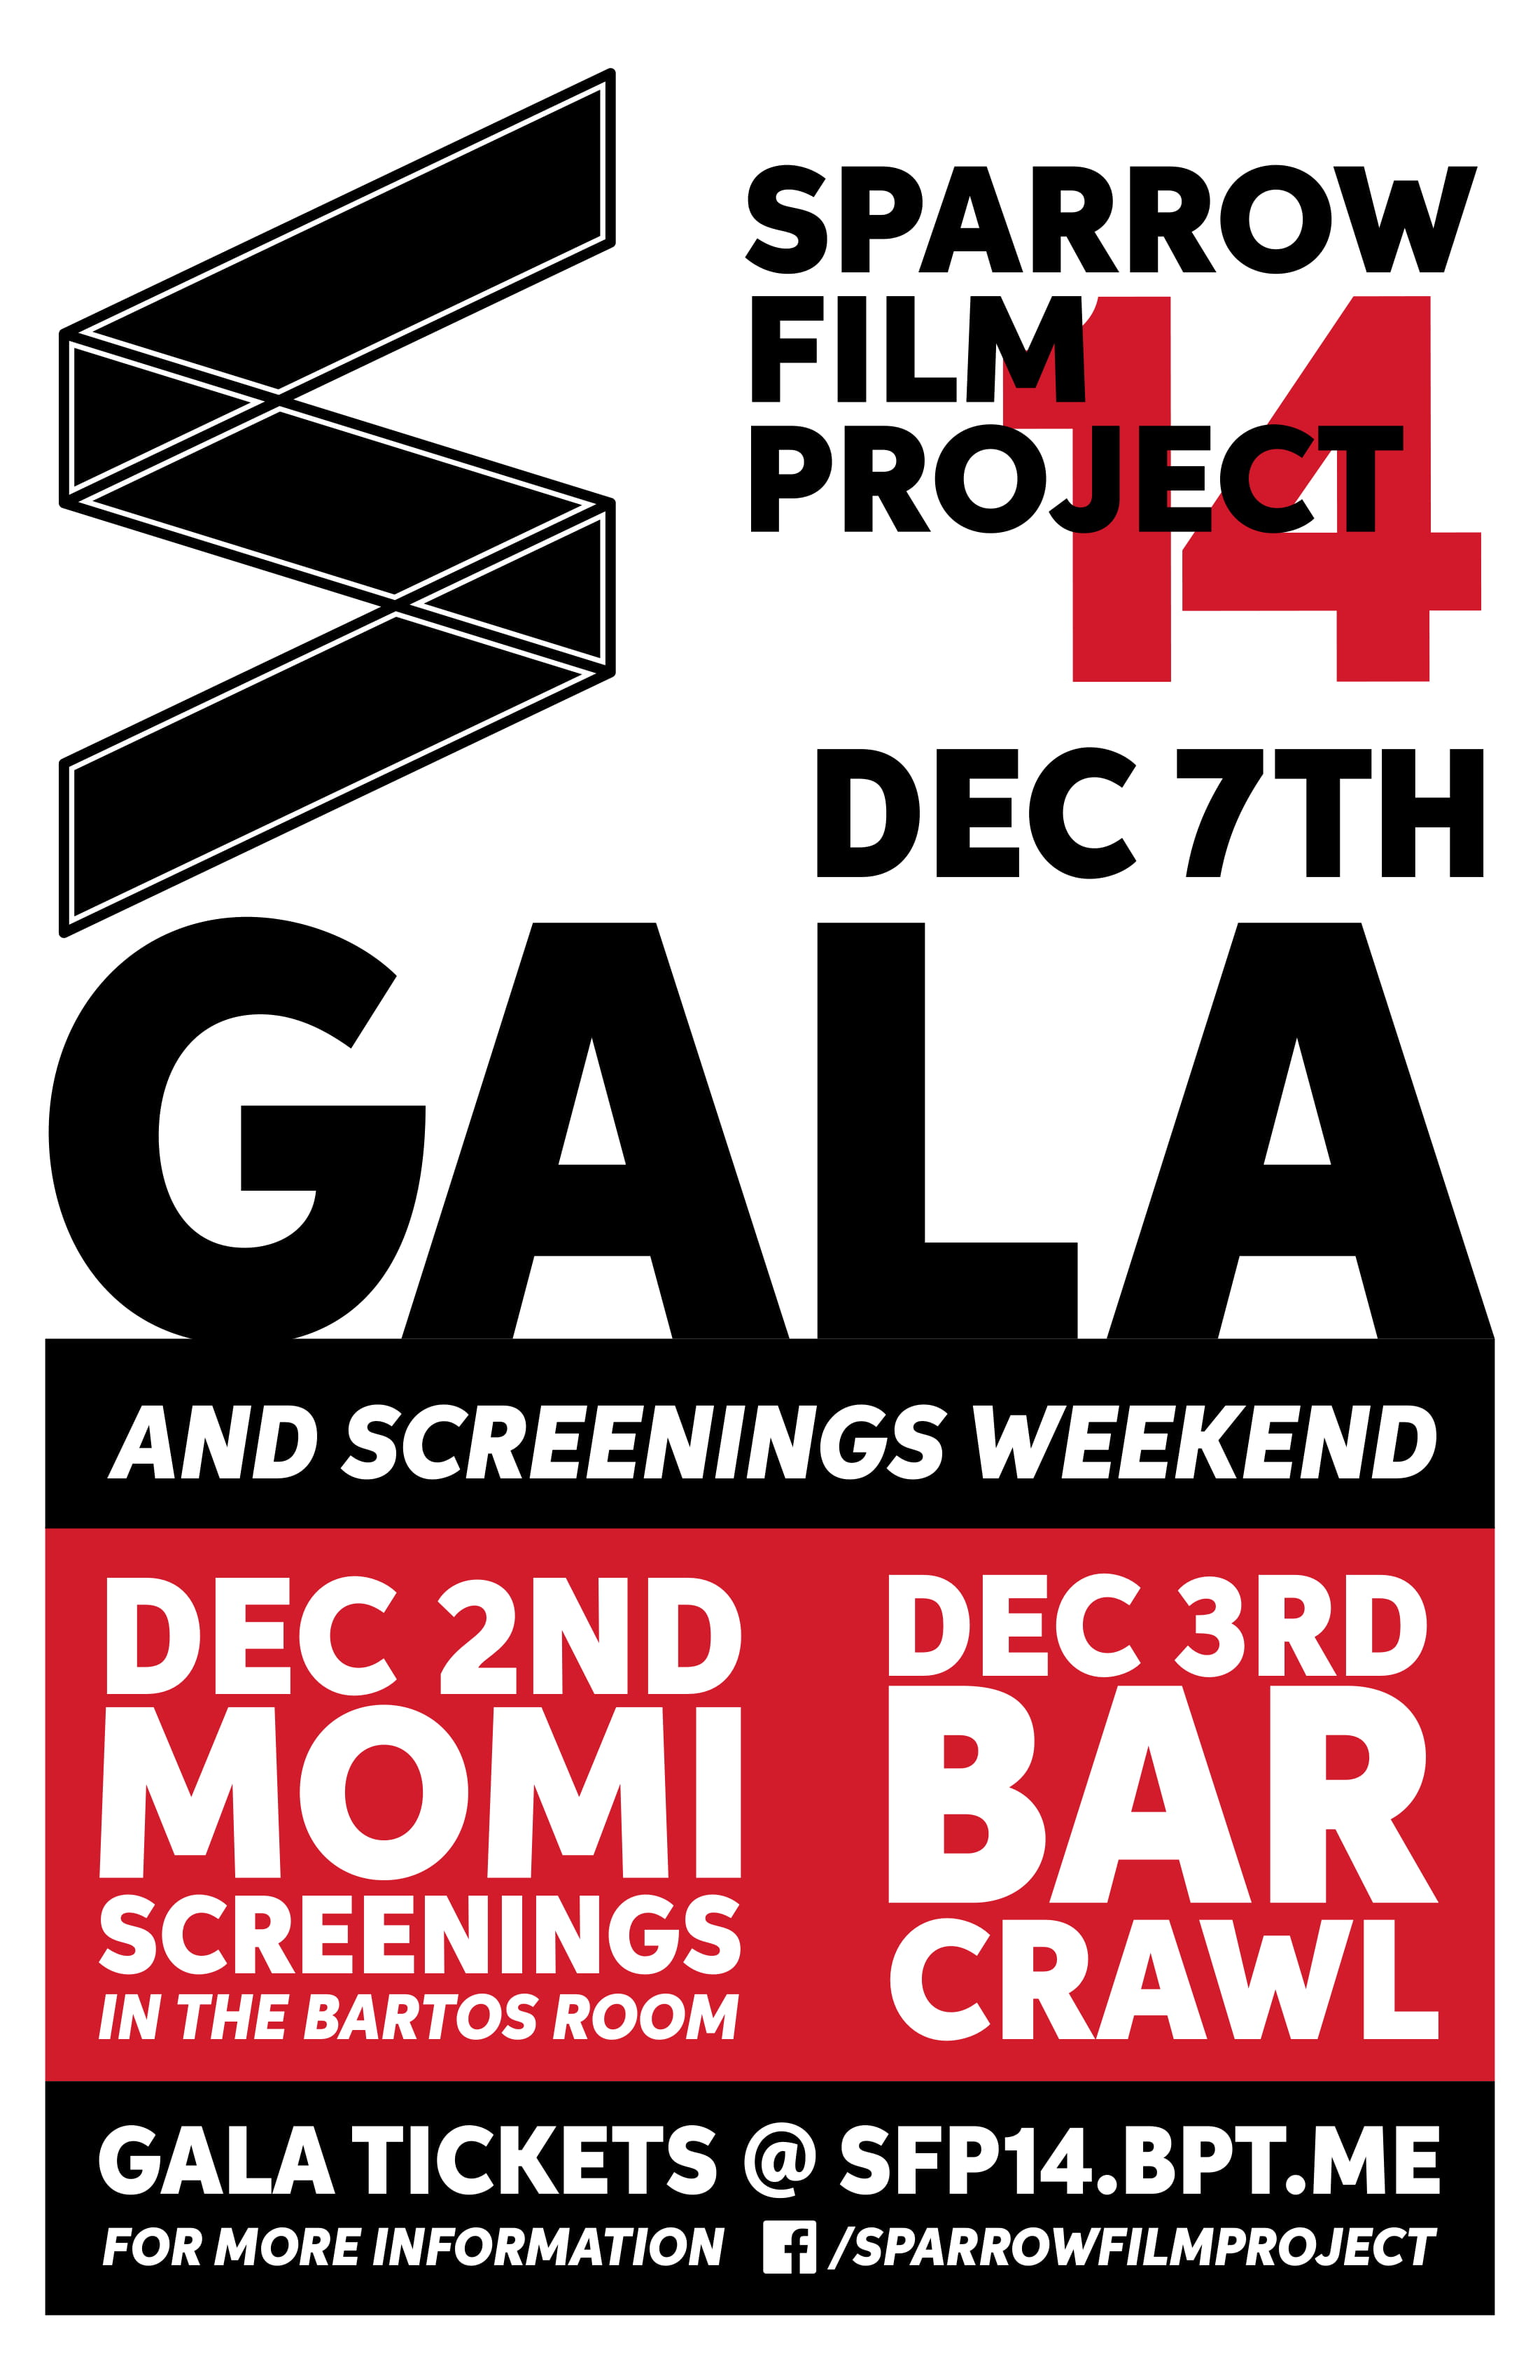 gala14-poster-1.jpg